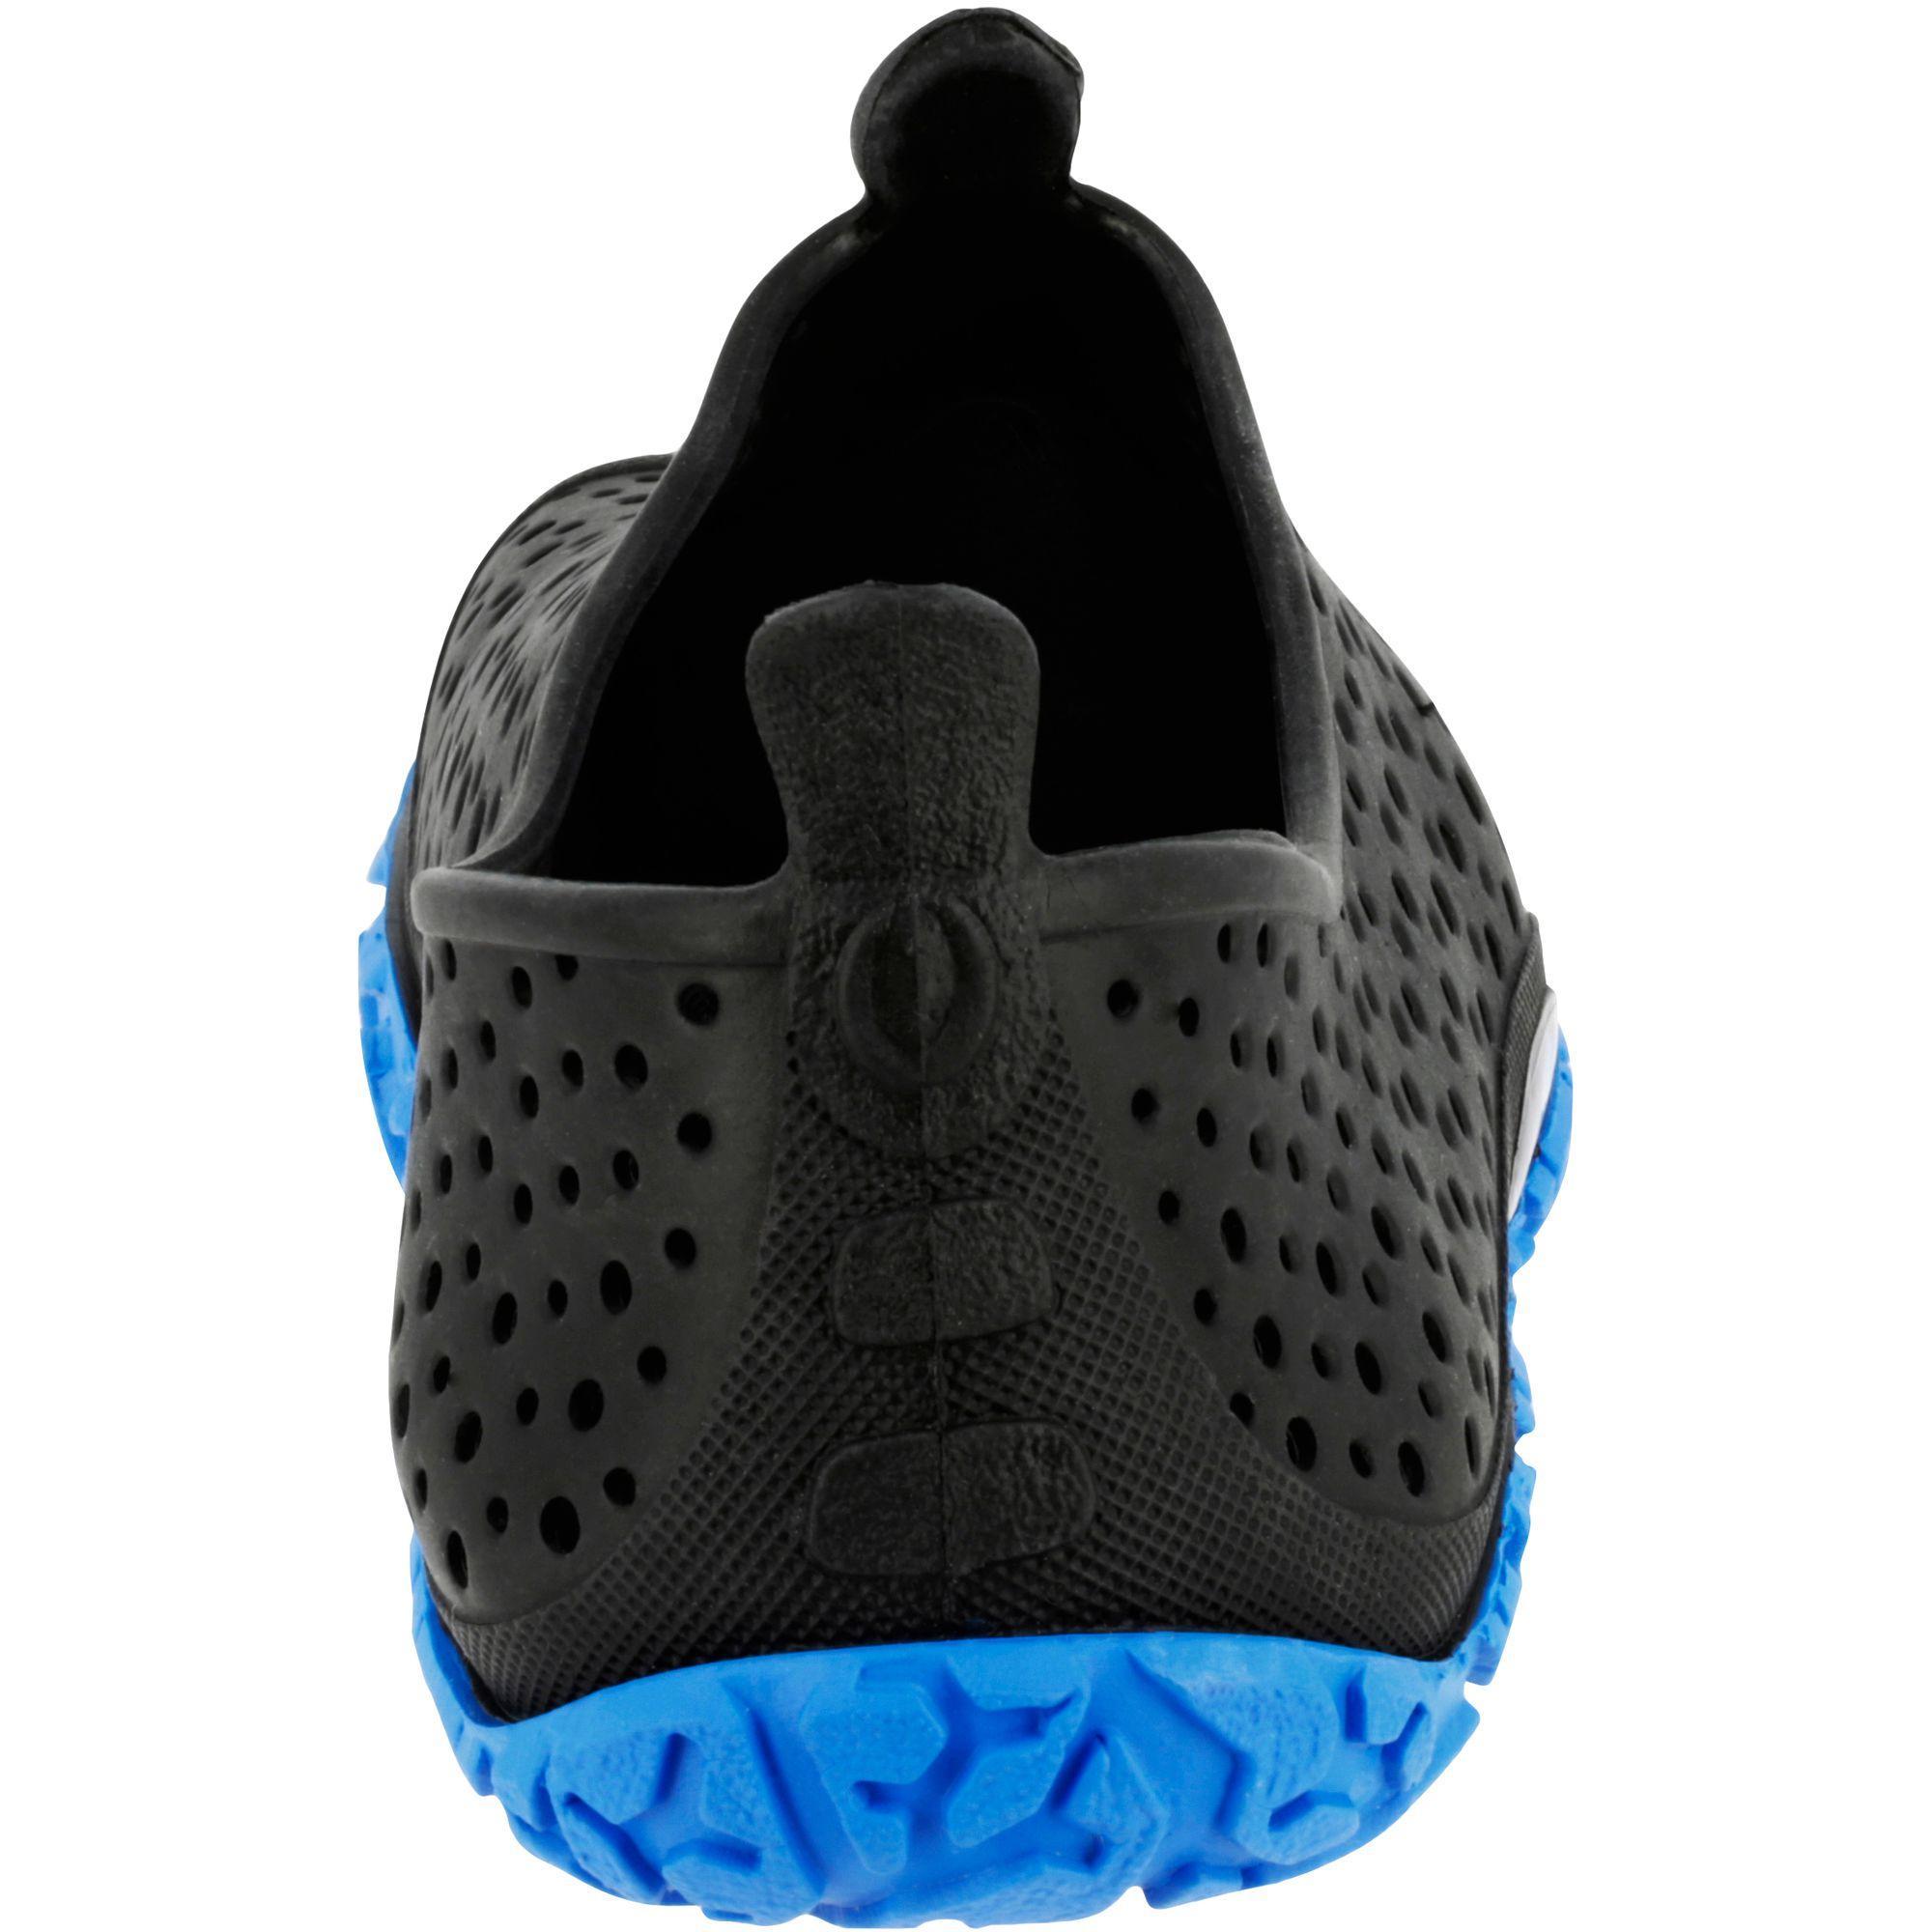 Chausson aquagym aquaforme AQUADOTS noir bleu